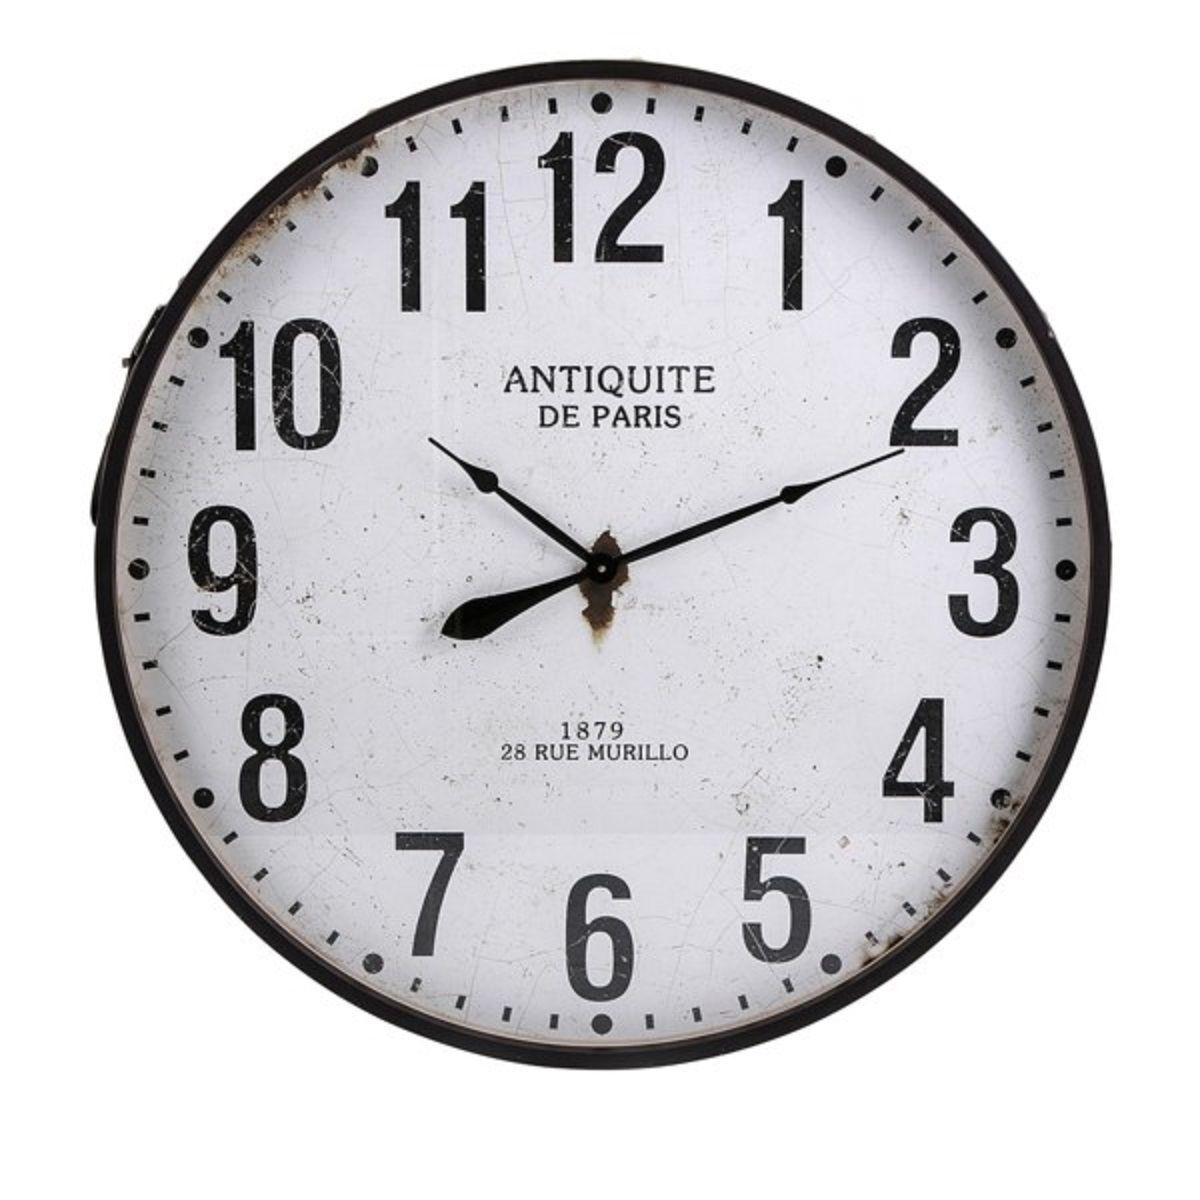 43 25 Black And White Lexington Wall Clock Oversized Wall Clock Wall Clock Round Wall Clocks